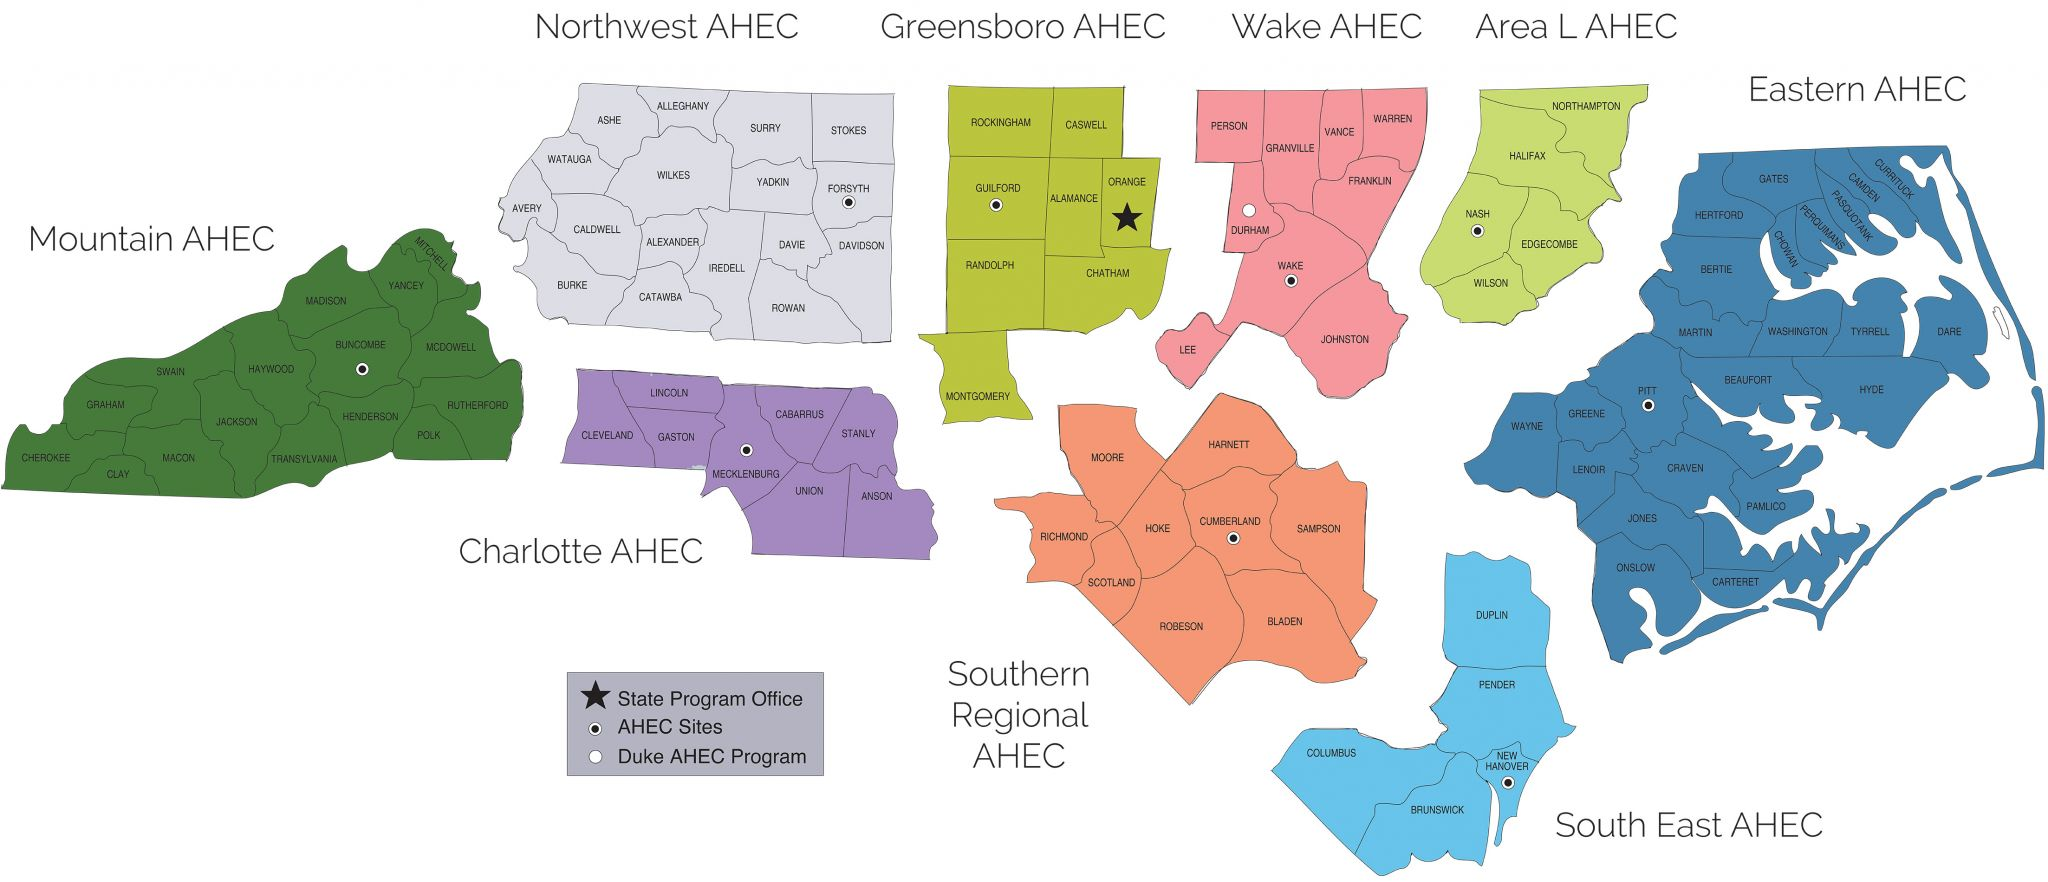 Regional AHEC Locations